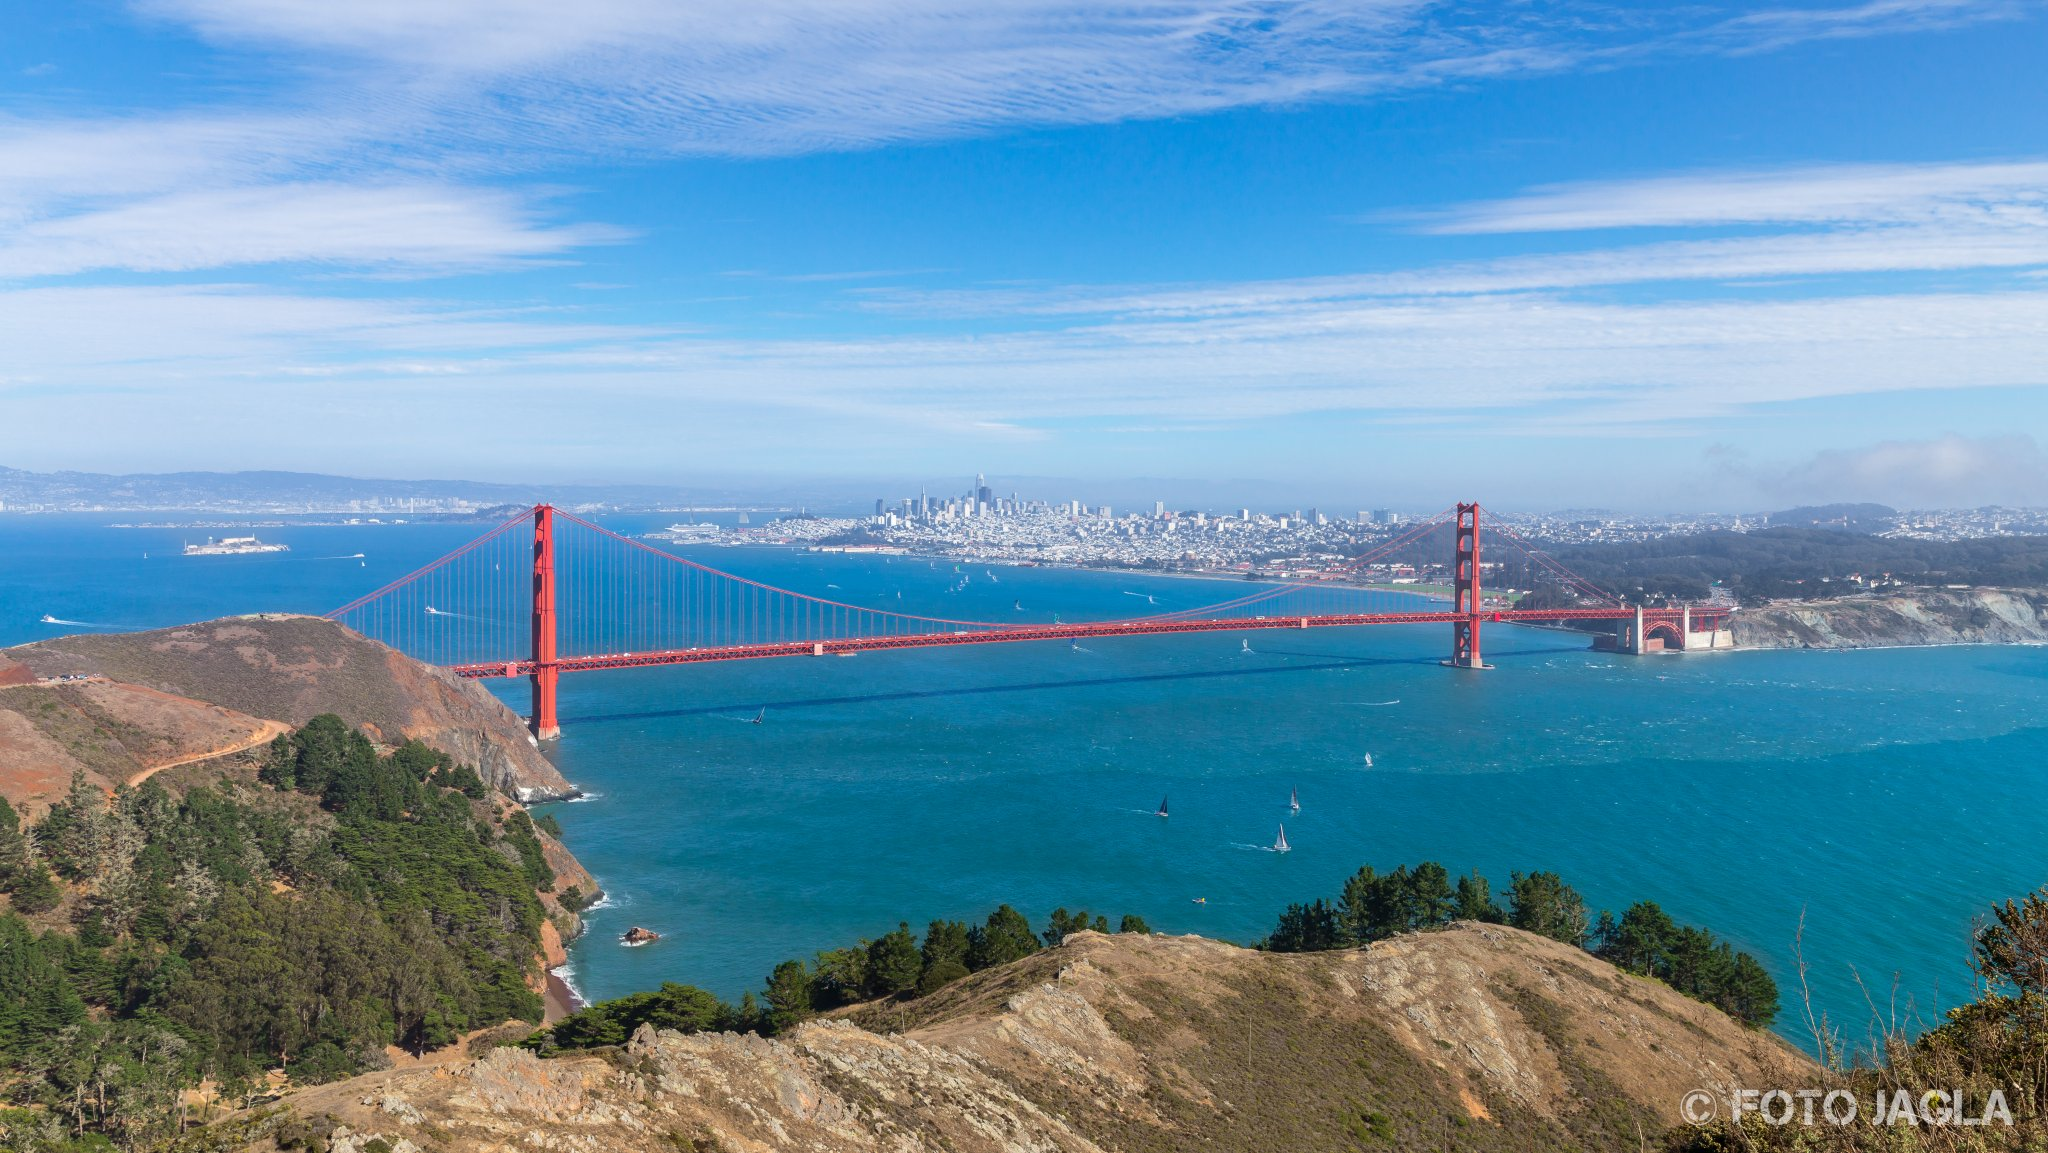 Kalifornien - September 2018 Golden Gate Bridge - Die Brücke über das goldene Tor San Francisco